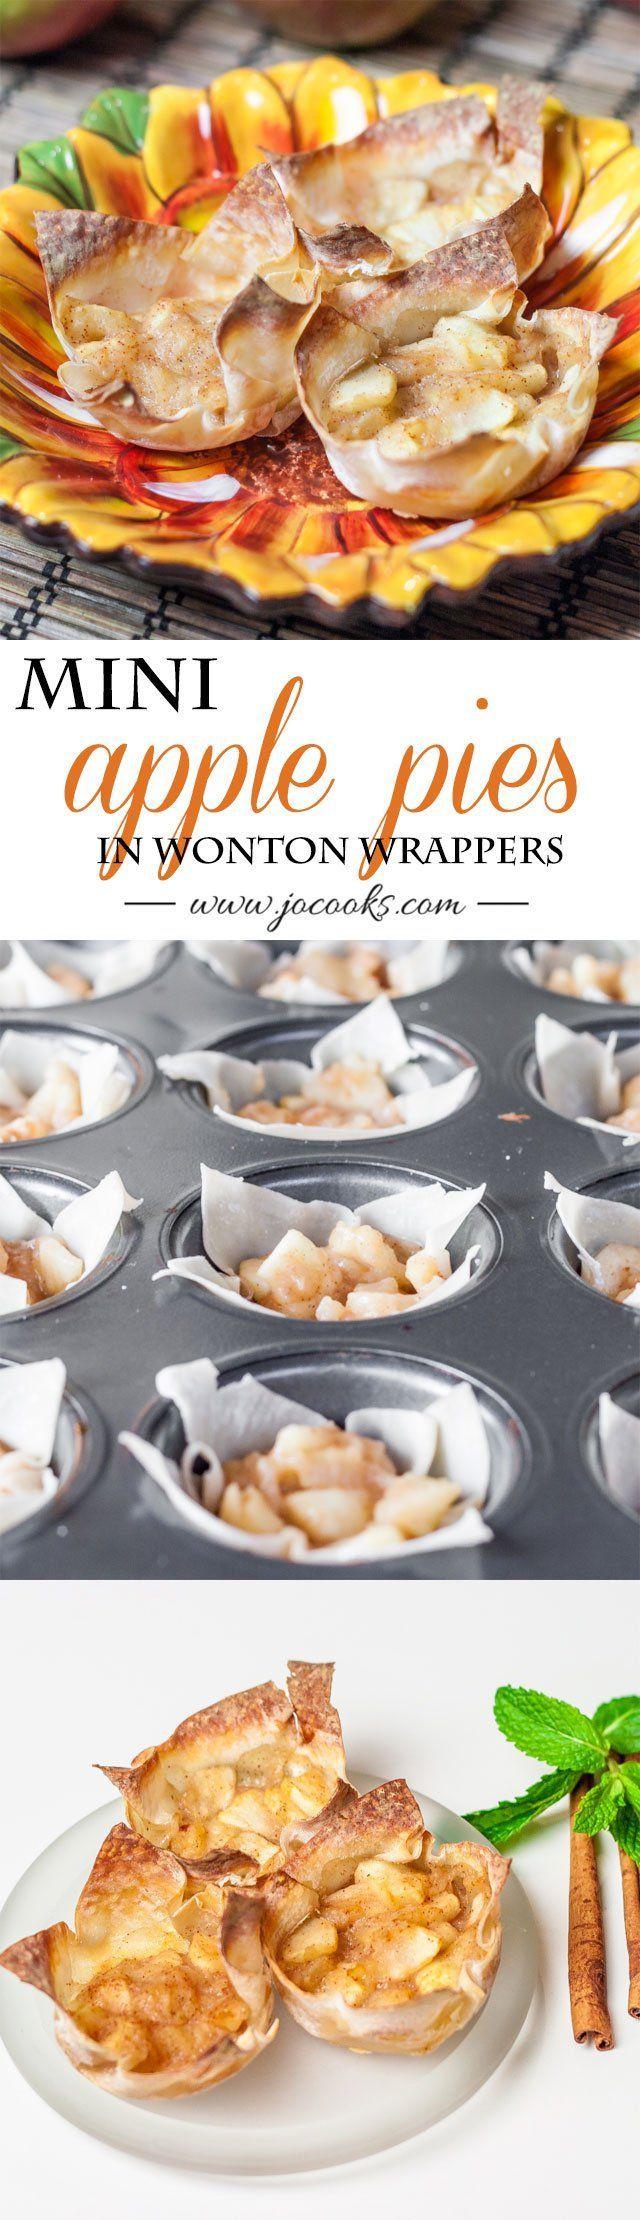 Mini Apple Pies in Wonton Wrappers Mini Apple Pies in Wonton Wrappers,